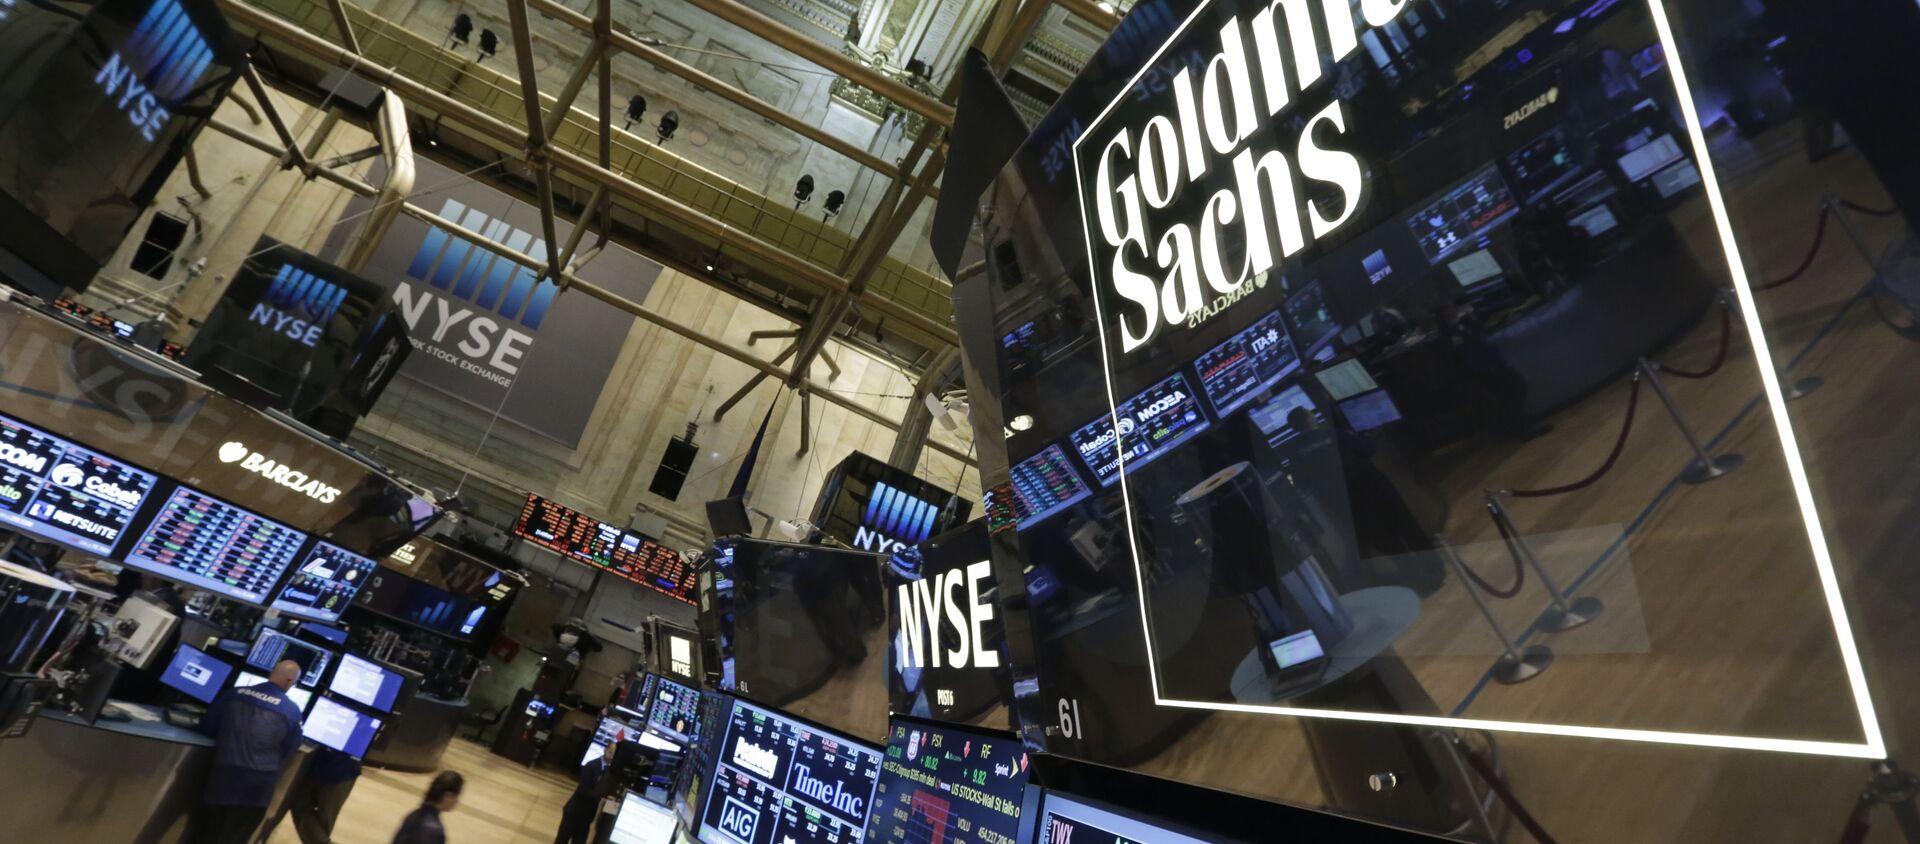 Goldman Sachs trading post on the floor of the New York Stock Exchange (File) - Sputnik Italia, 1920, 20.06.2020